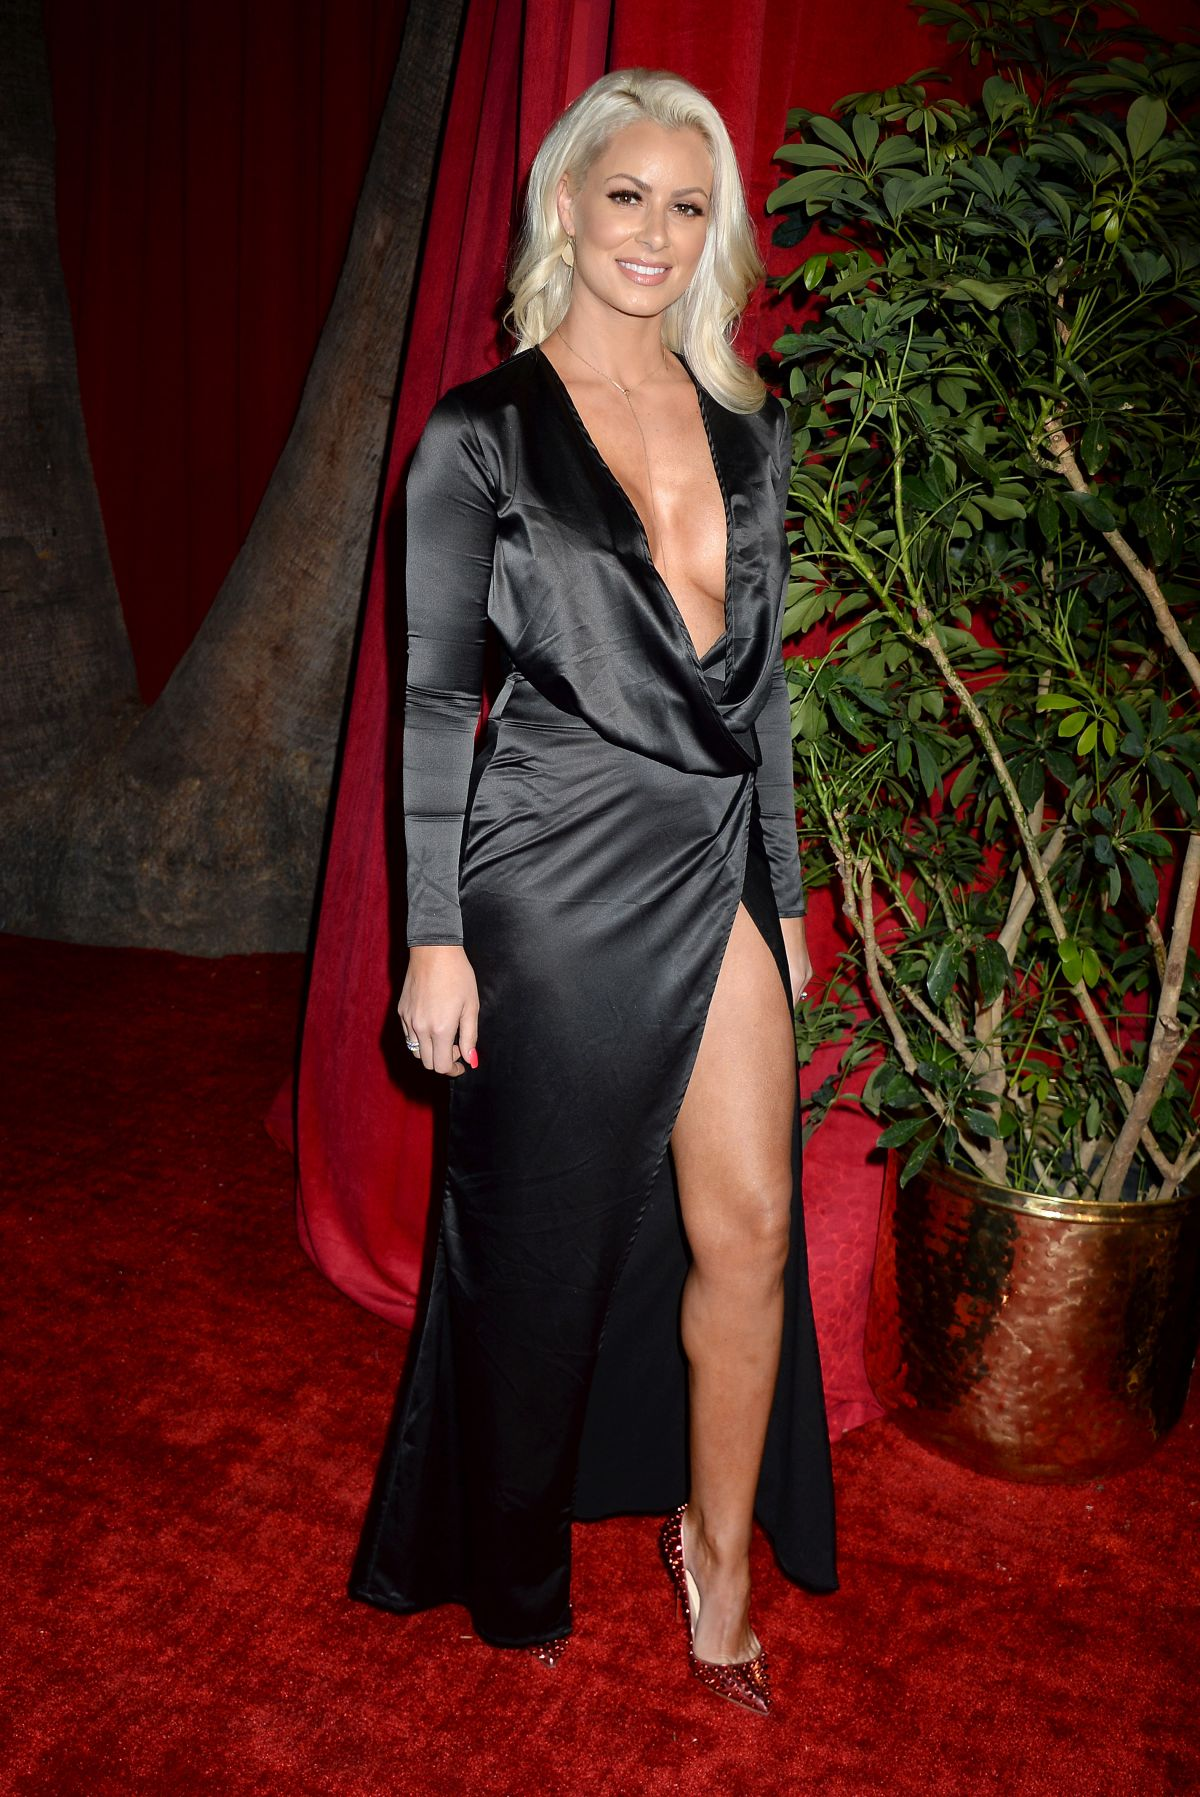 Hot Maryse Mizanin nudes (42 photo), Sexy, Bikini, Twitter, panties 2015